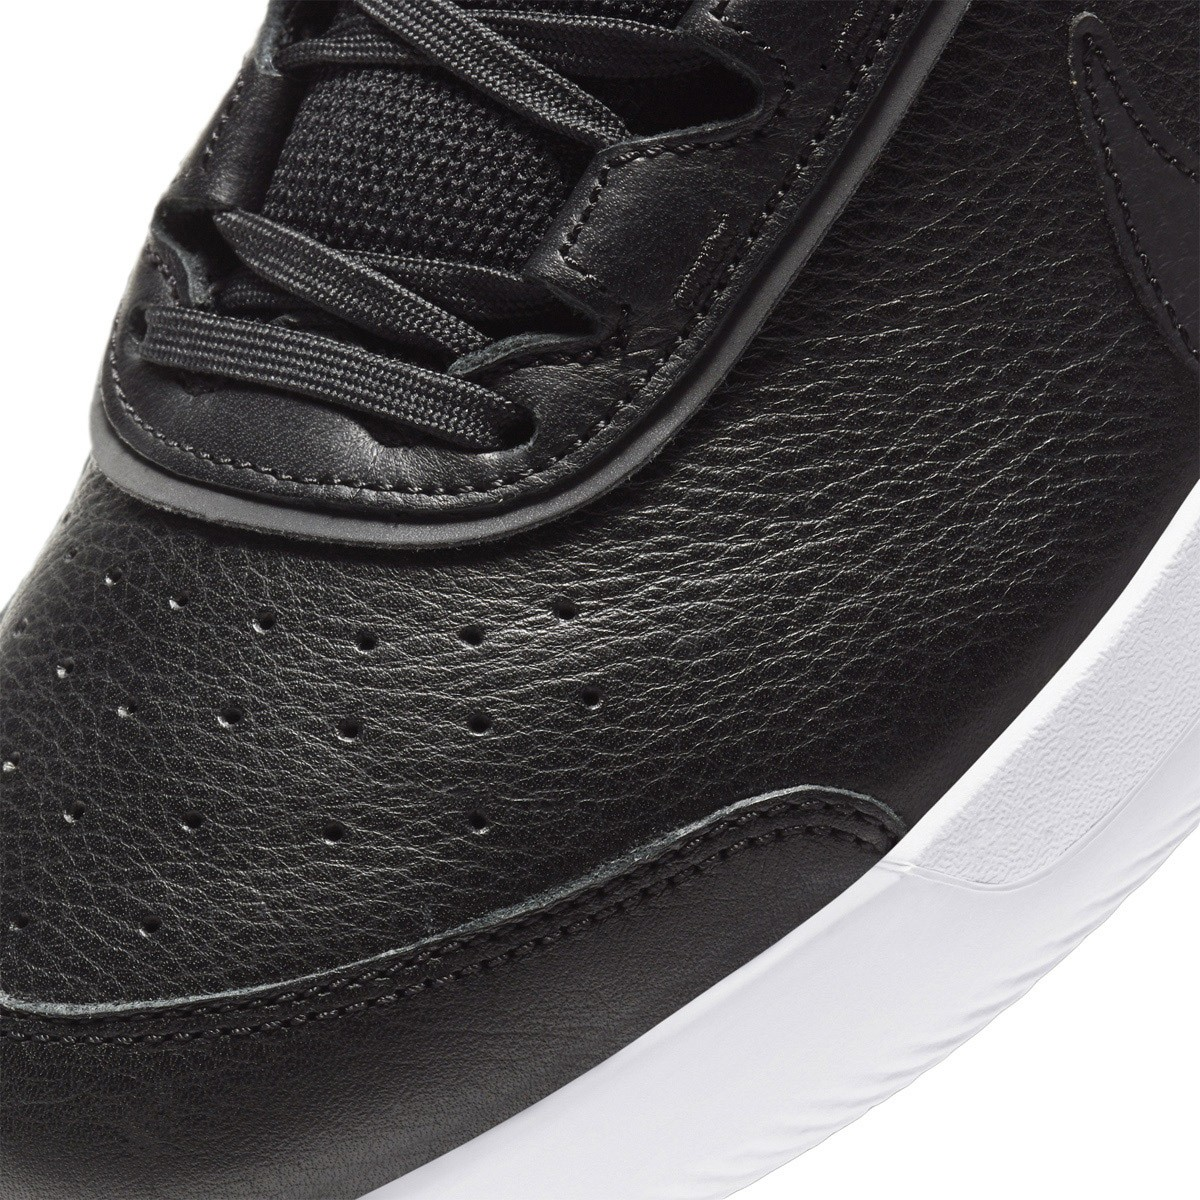 NIKE AIR MAX VAPOR WING SHOES - NIKE - Men's - Shoes   Tennispro